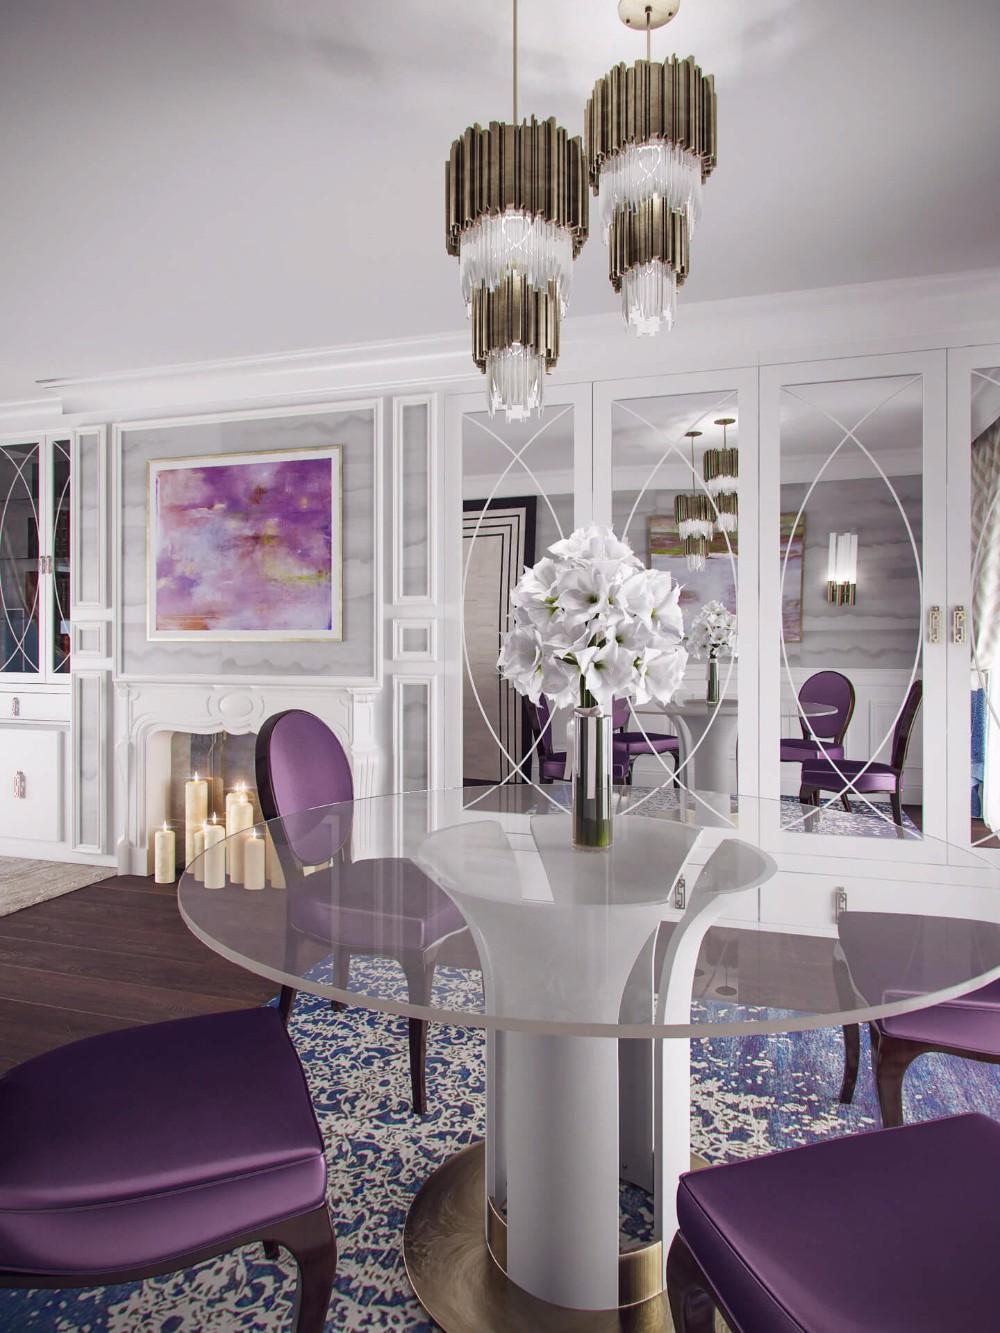 ... Interior Designer Viktoria Kiorsaku0027s Most Stylish Decor Secrets  Interior Designer Interior Designer Victoria Kiorsaku0027s Most Stylish ...